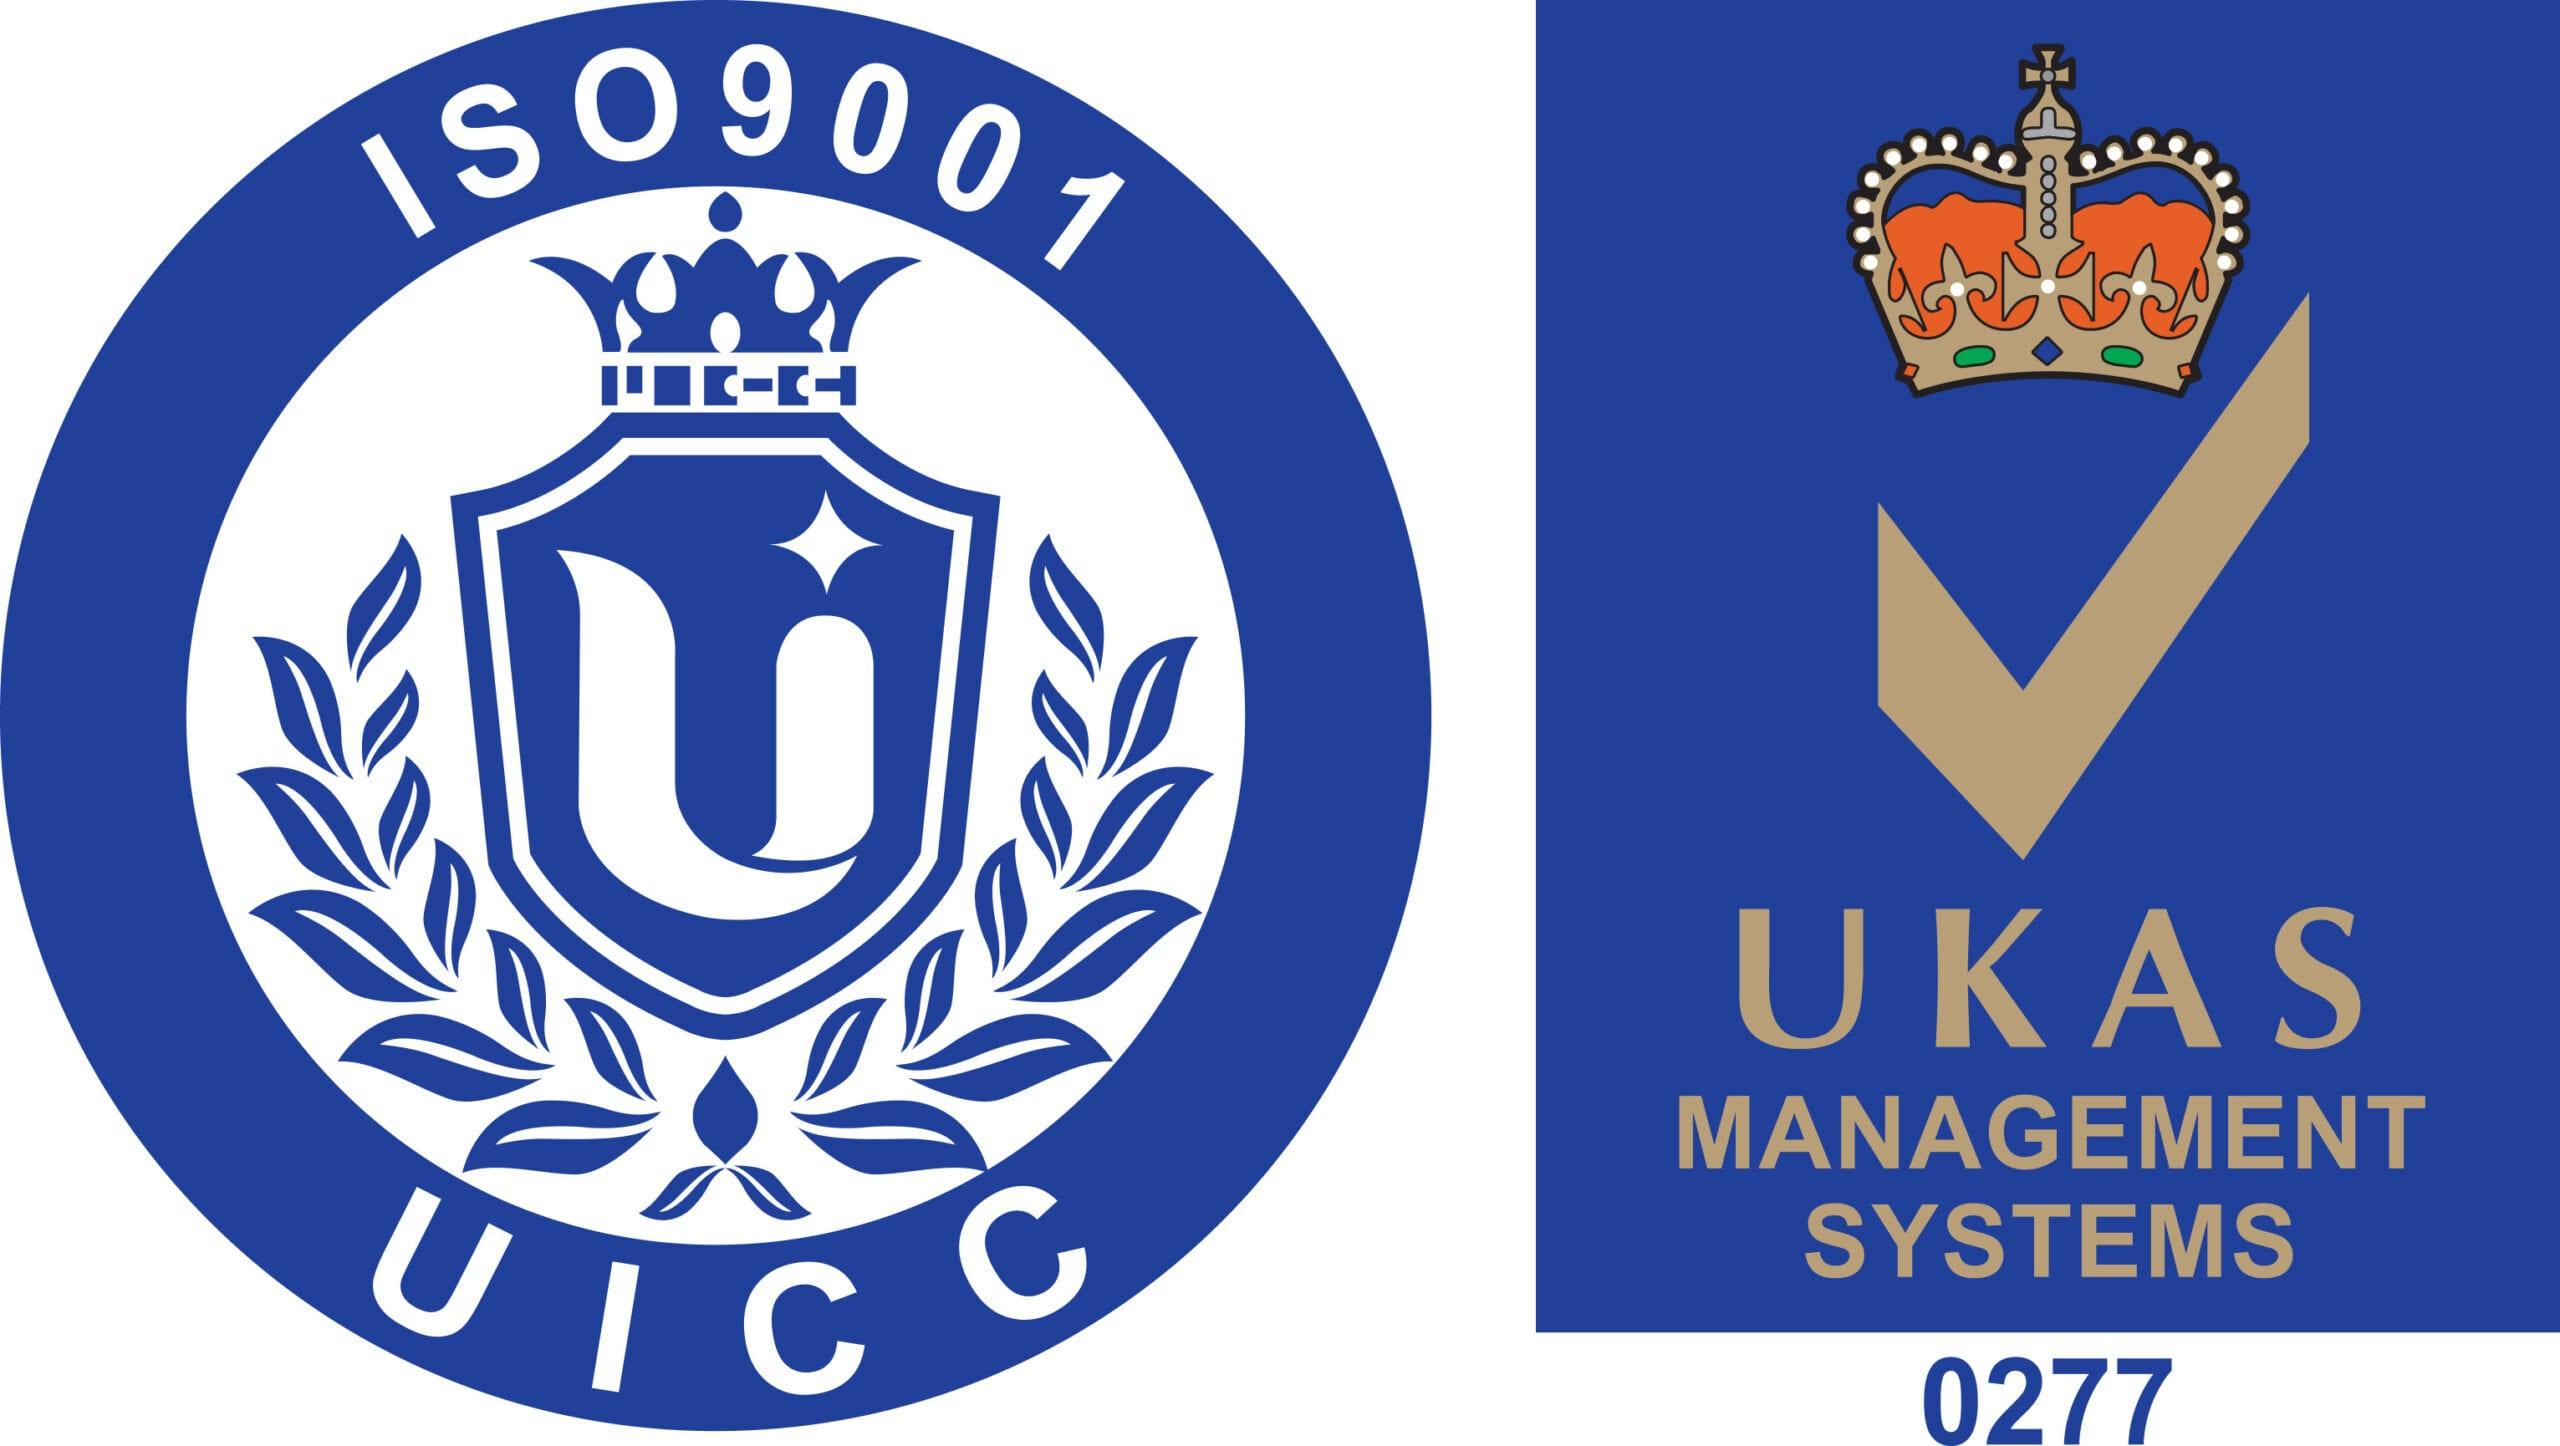 UKAS ISO 9001 OL